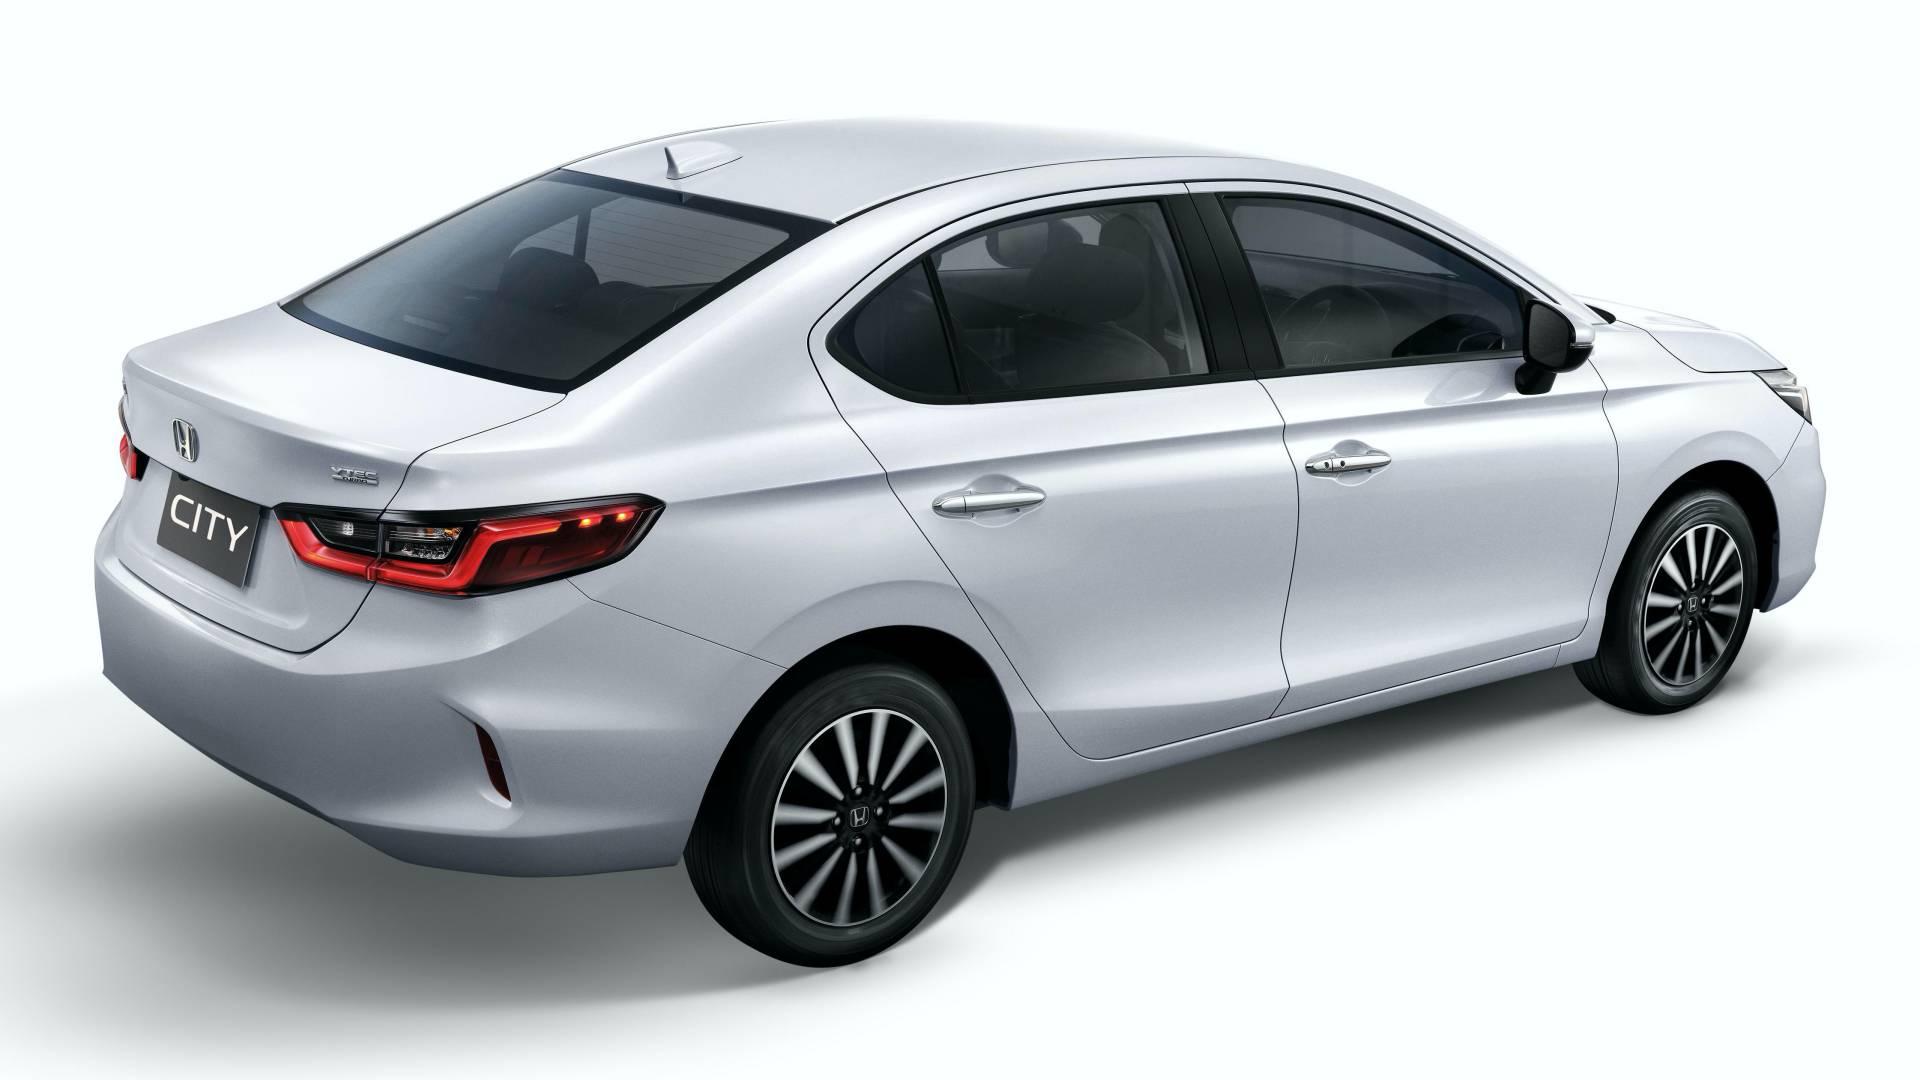 2020 Honda City Looks Like The Civic Shares Platform With